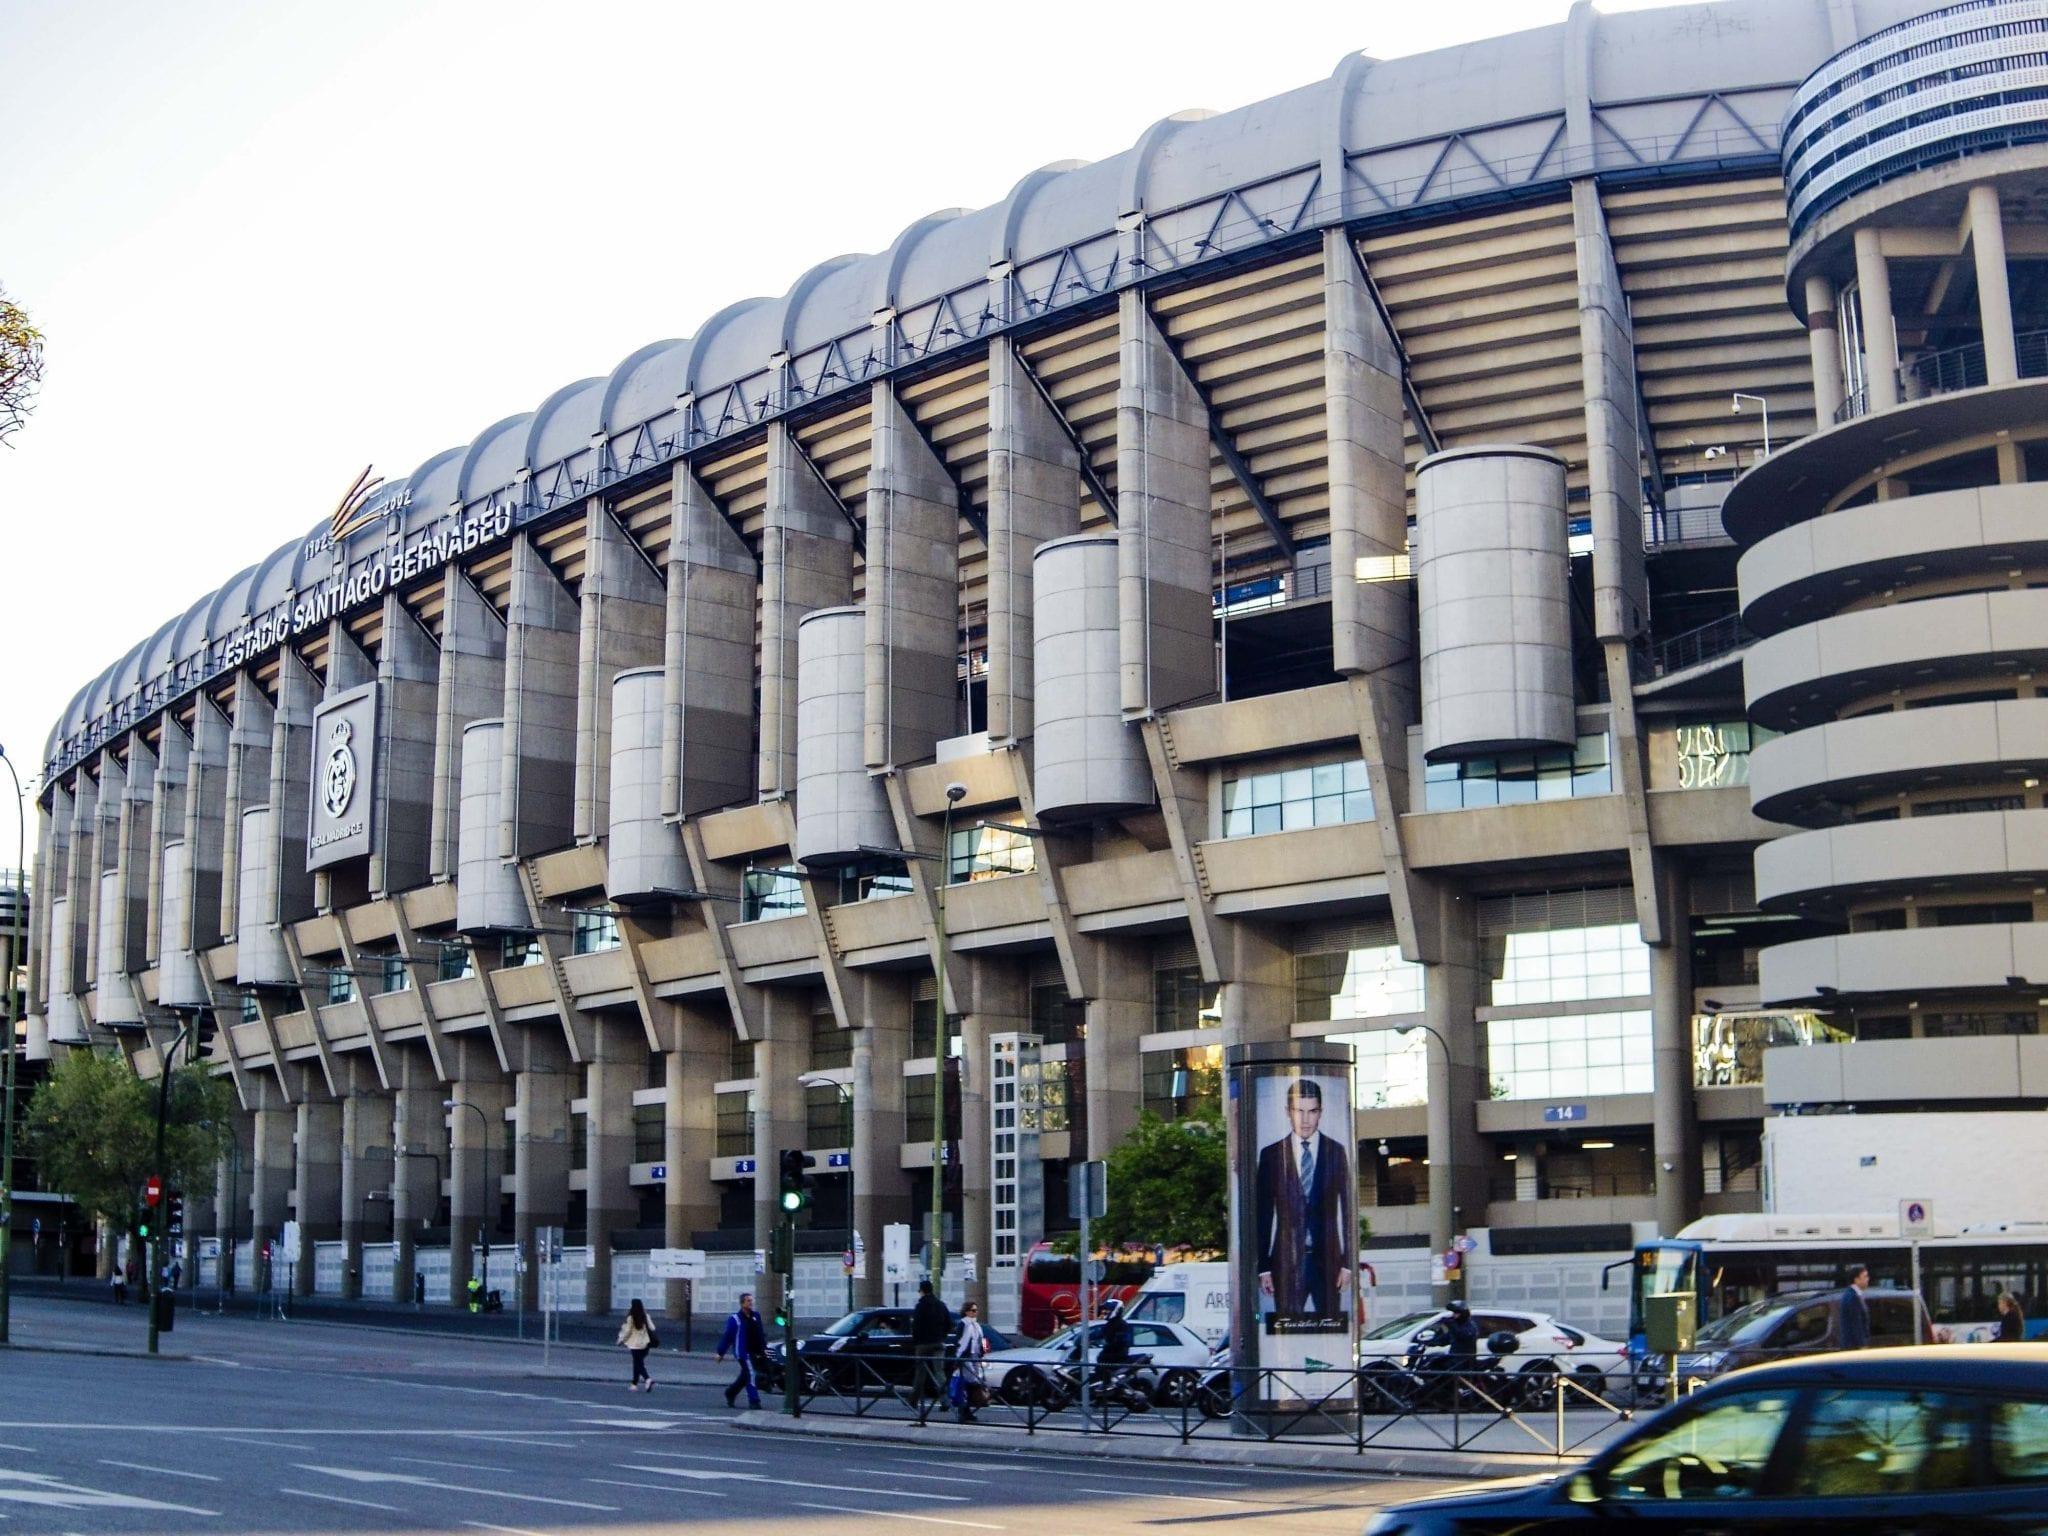 Get tickets to real madrid games santiago bernabeu stadium for Puerta 53 santiago bernabeu